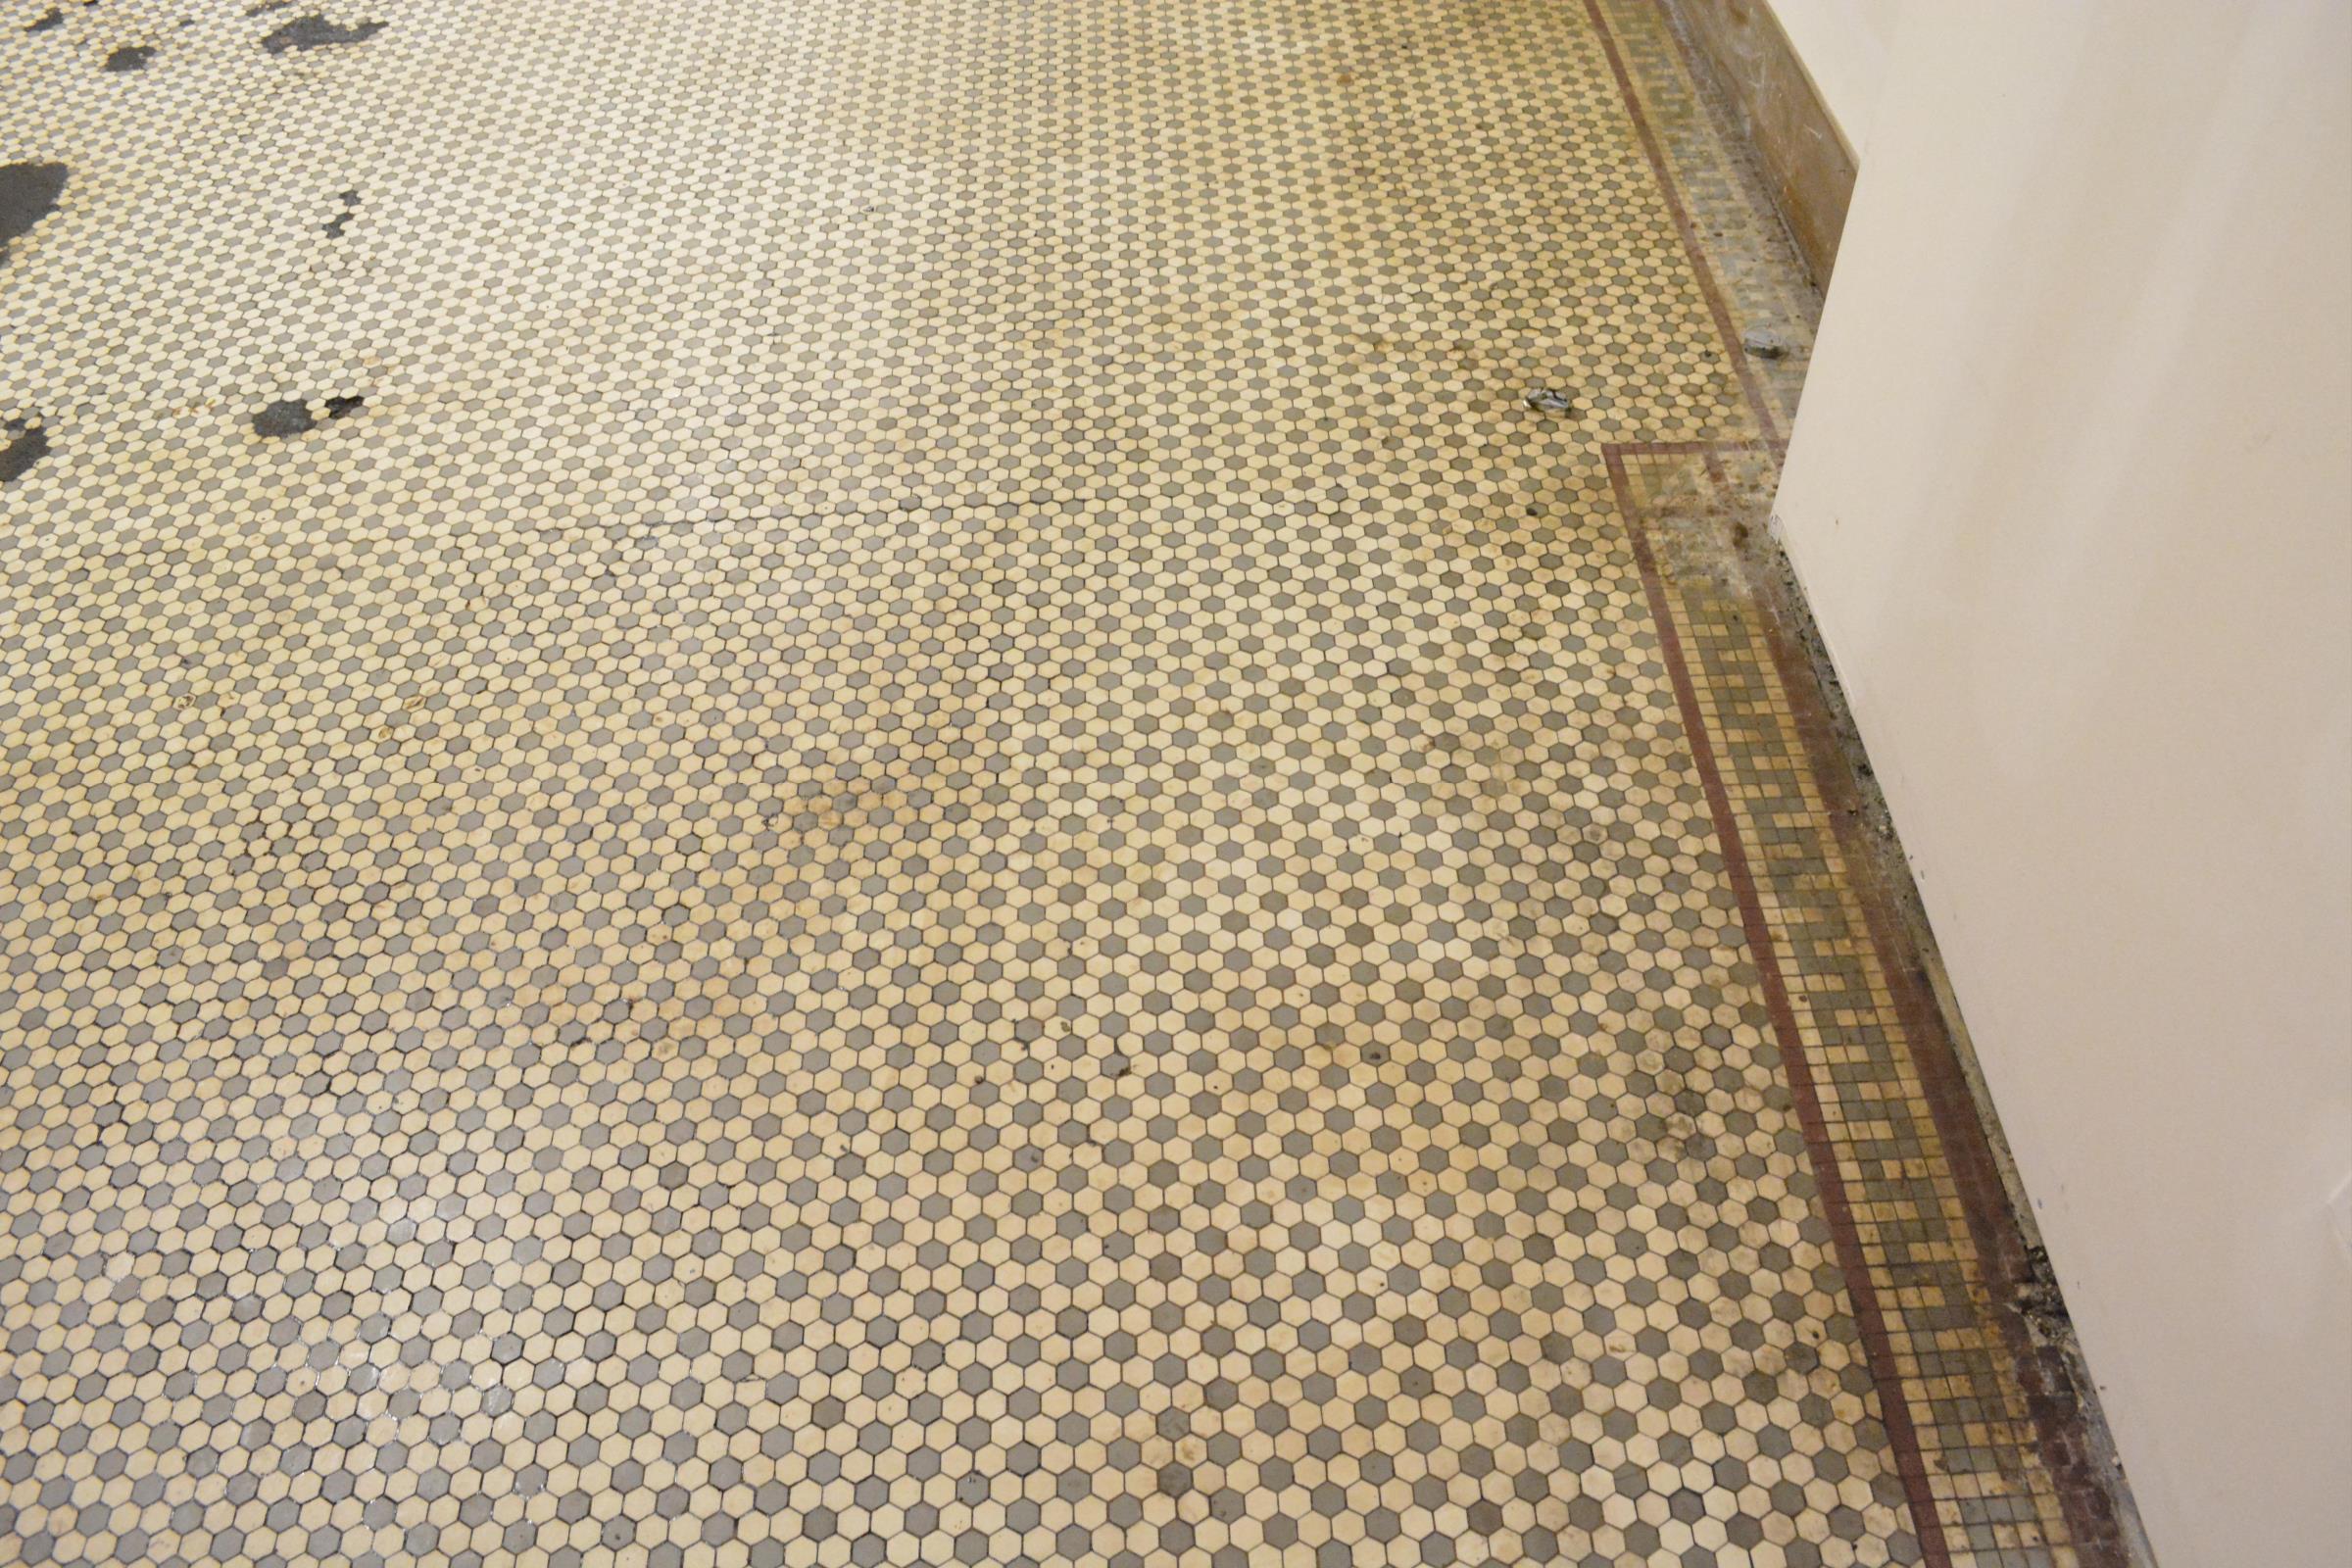 13c - 46 Lisbon 1st Retail After Tile Detail.JPG